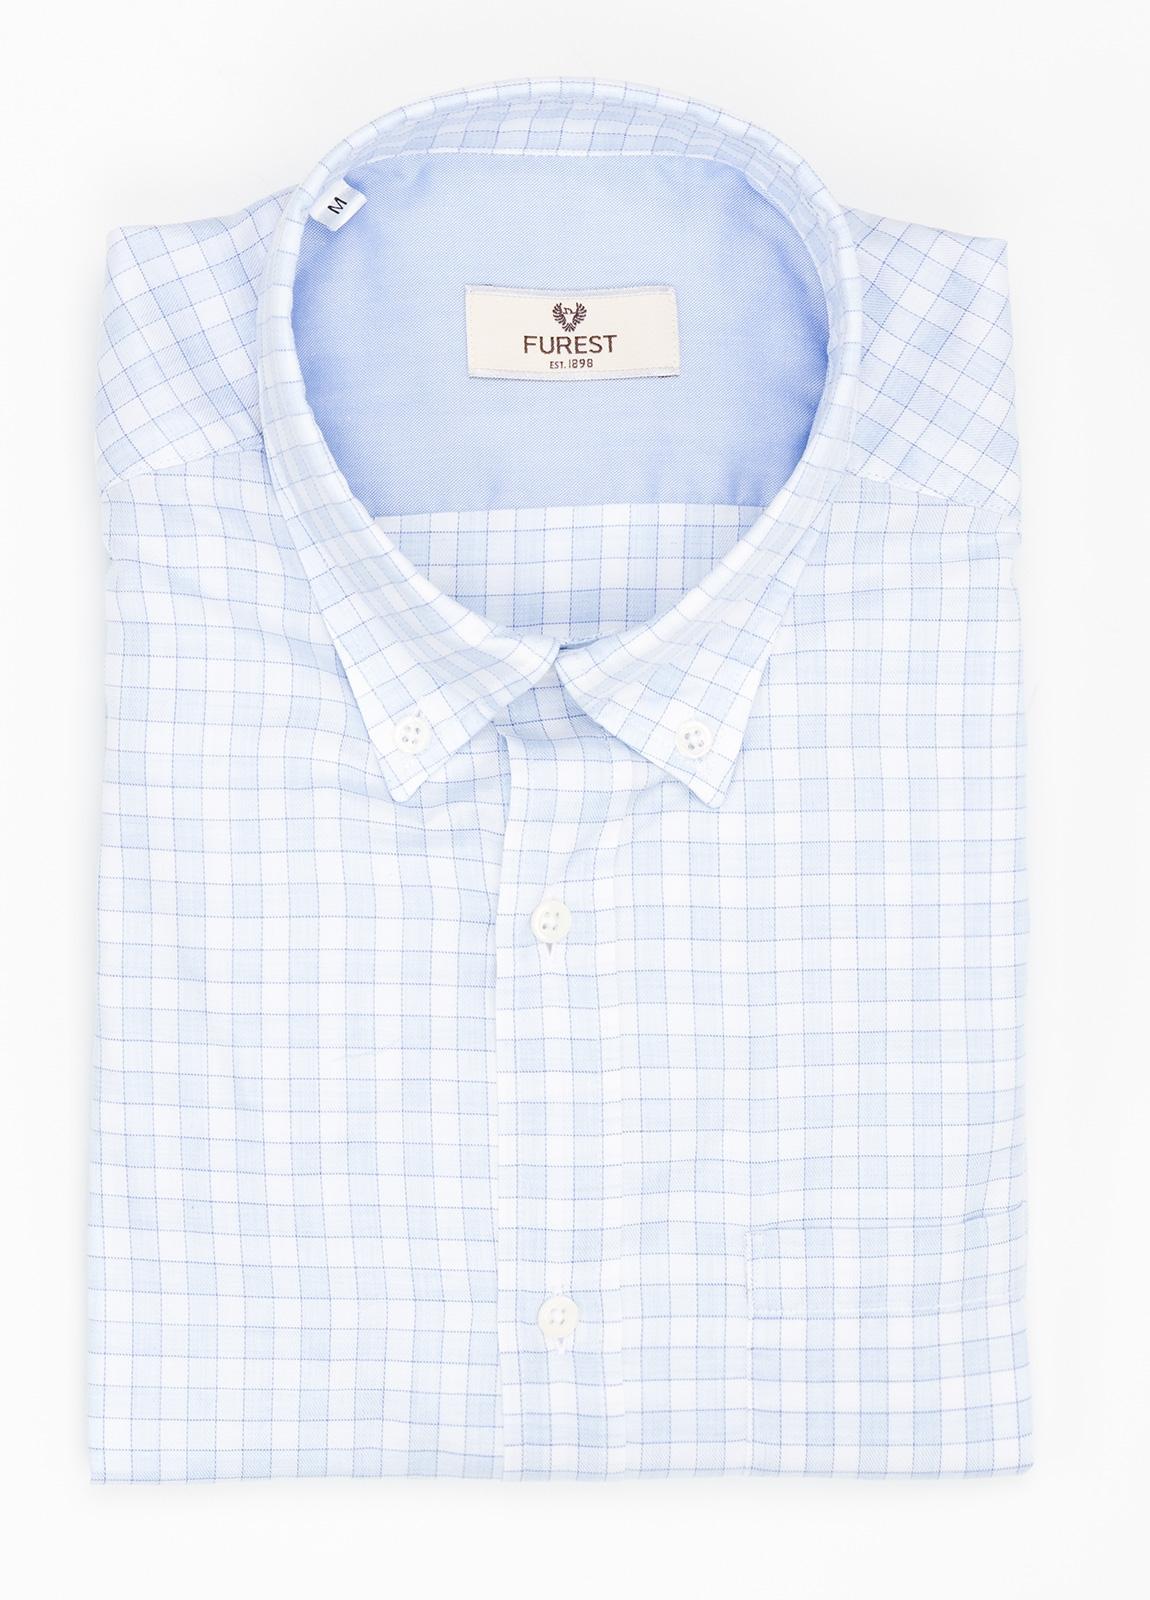 Camisa Leisure Wear REGULAR FIT Modelo BOTTON DOWN cuadros color azul celeste. 100% Algodón.